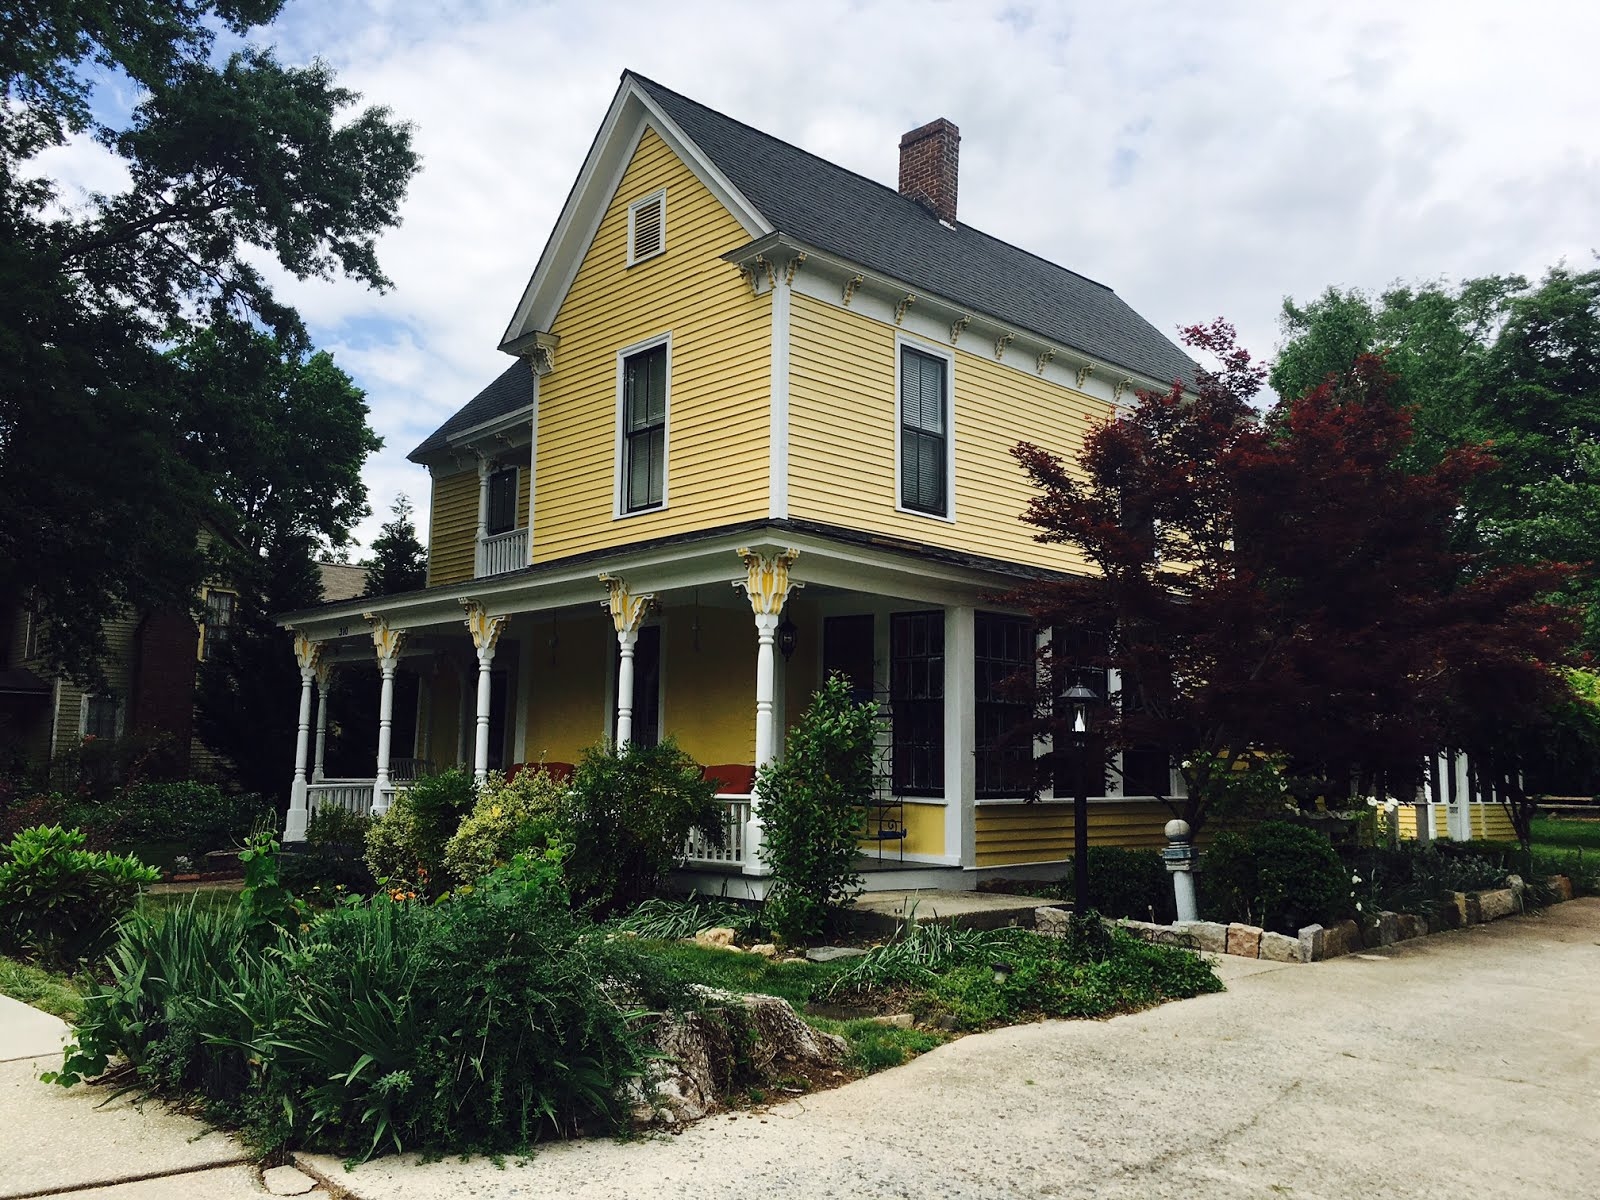 310 E. Bank Street, Salisbury NC 28144 ~ circa 1895 ~ $249,900